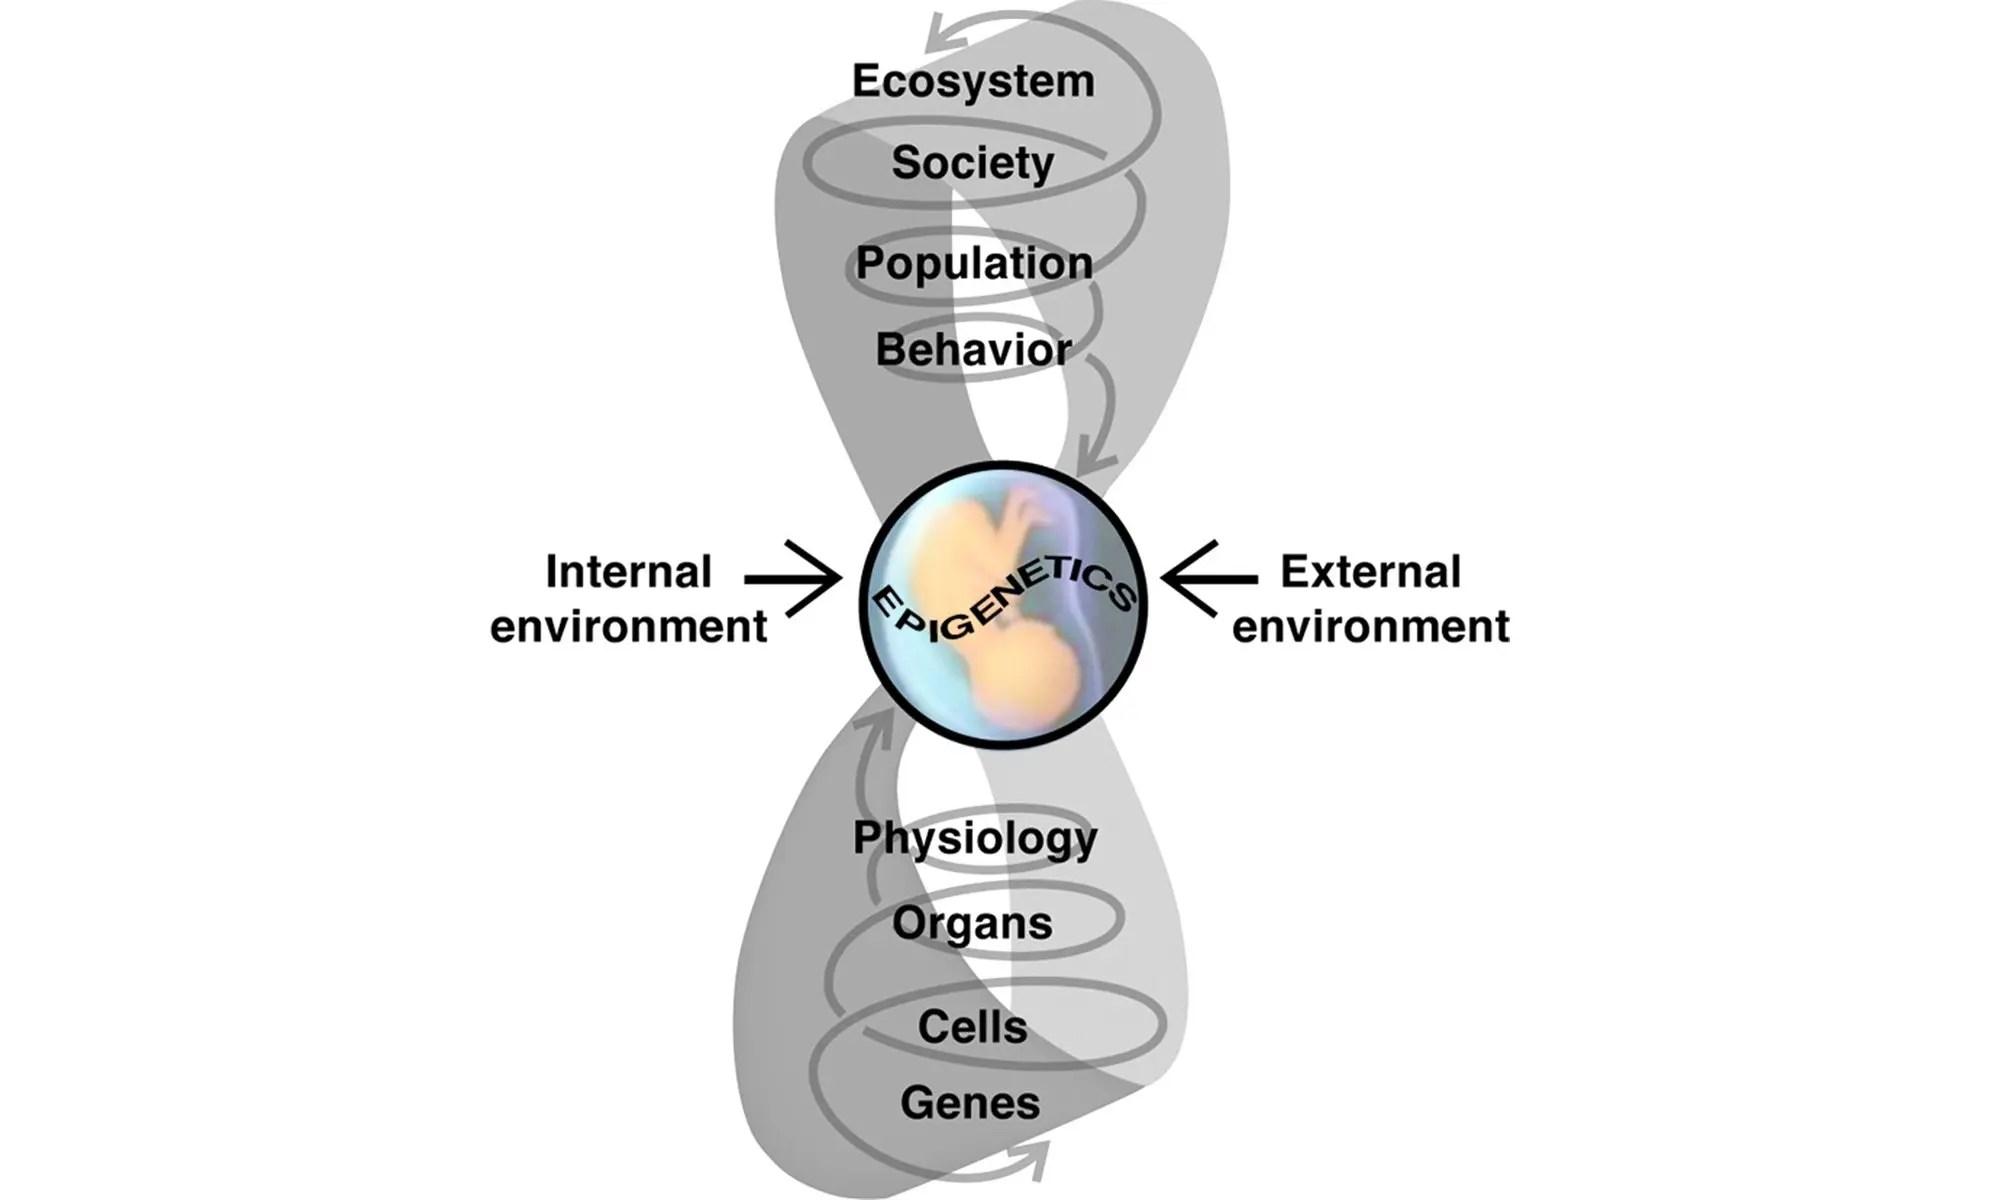 image of Epigenetics, Evolution, Endocrine Disruption, Health, and Disease